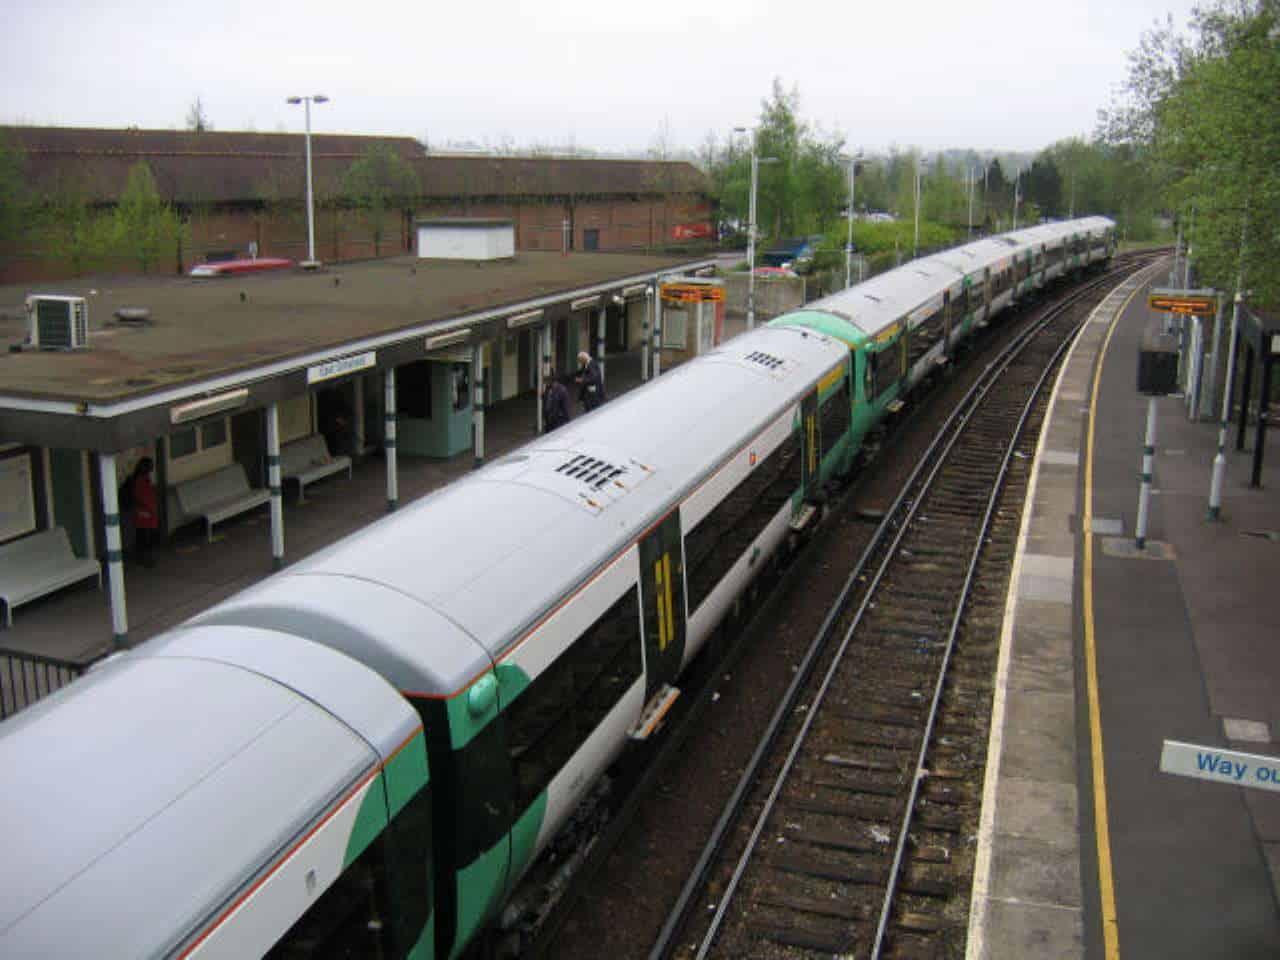 East Grinstead railway station